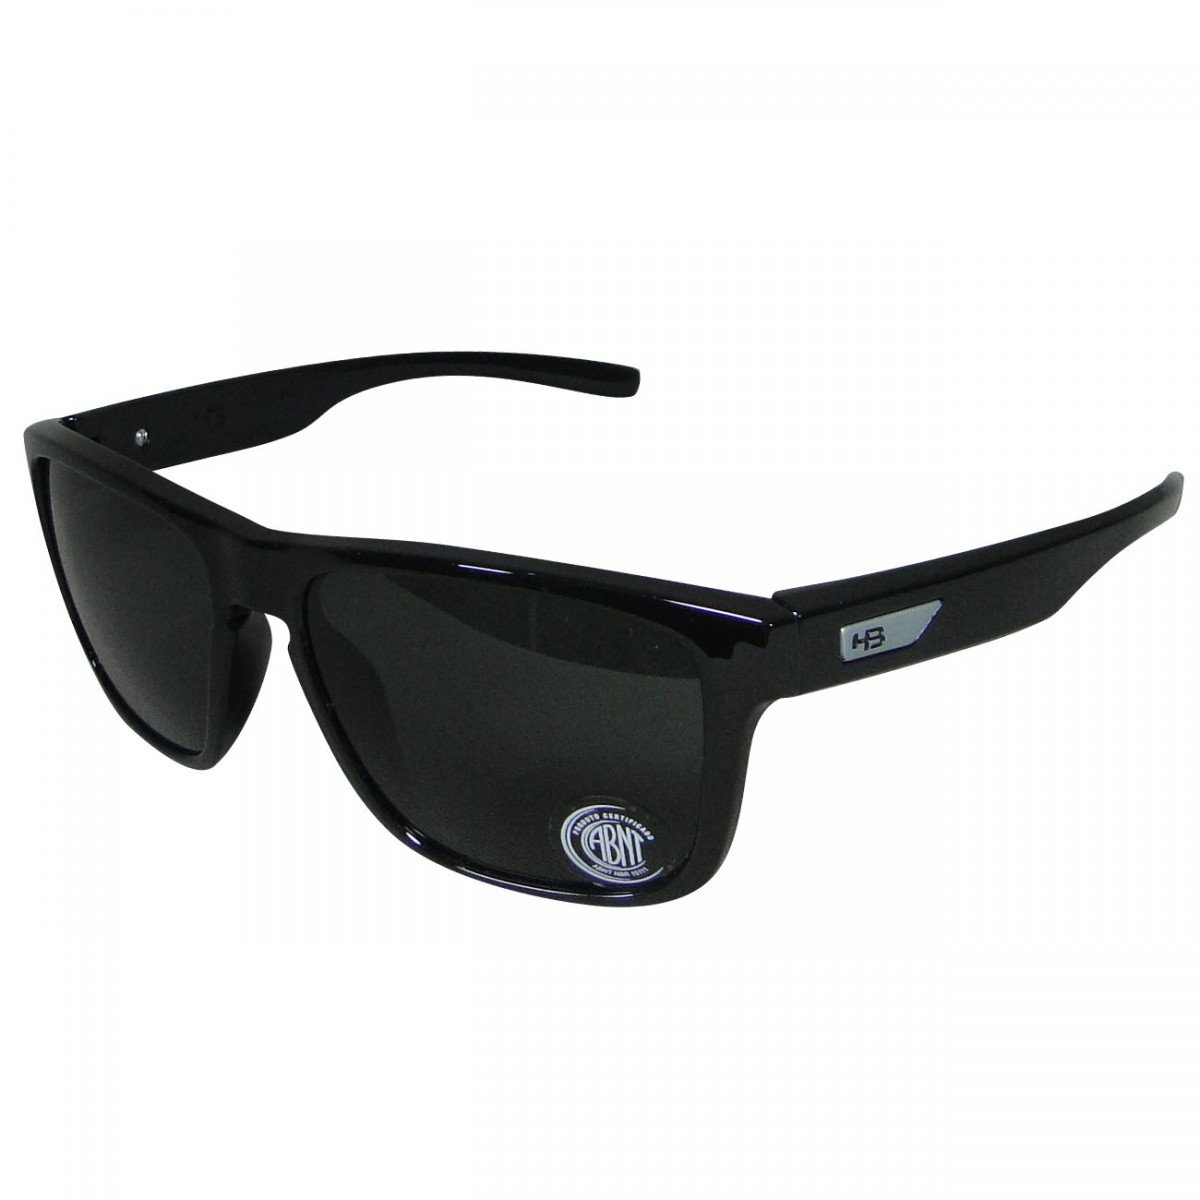 Oculos HB H-Bomb - Preto - Compre Agora   Netshoes da802a3b57